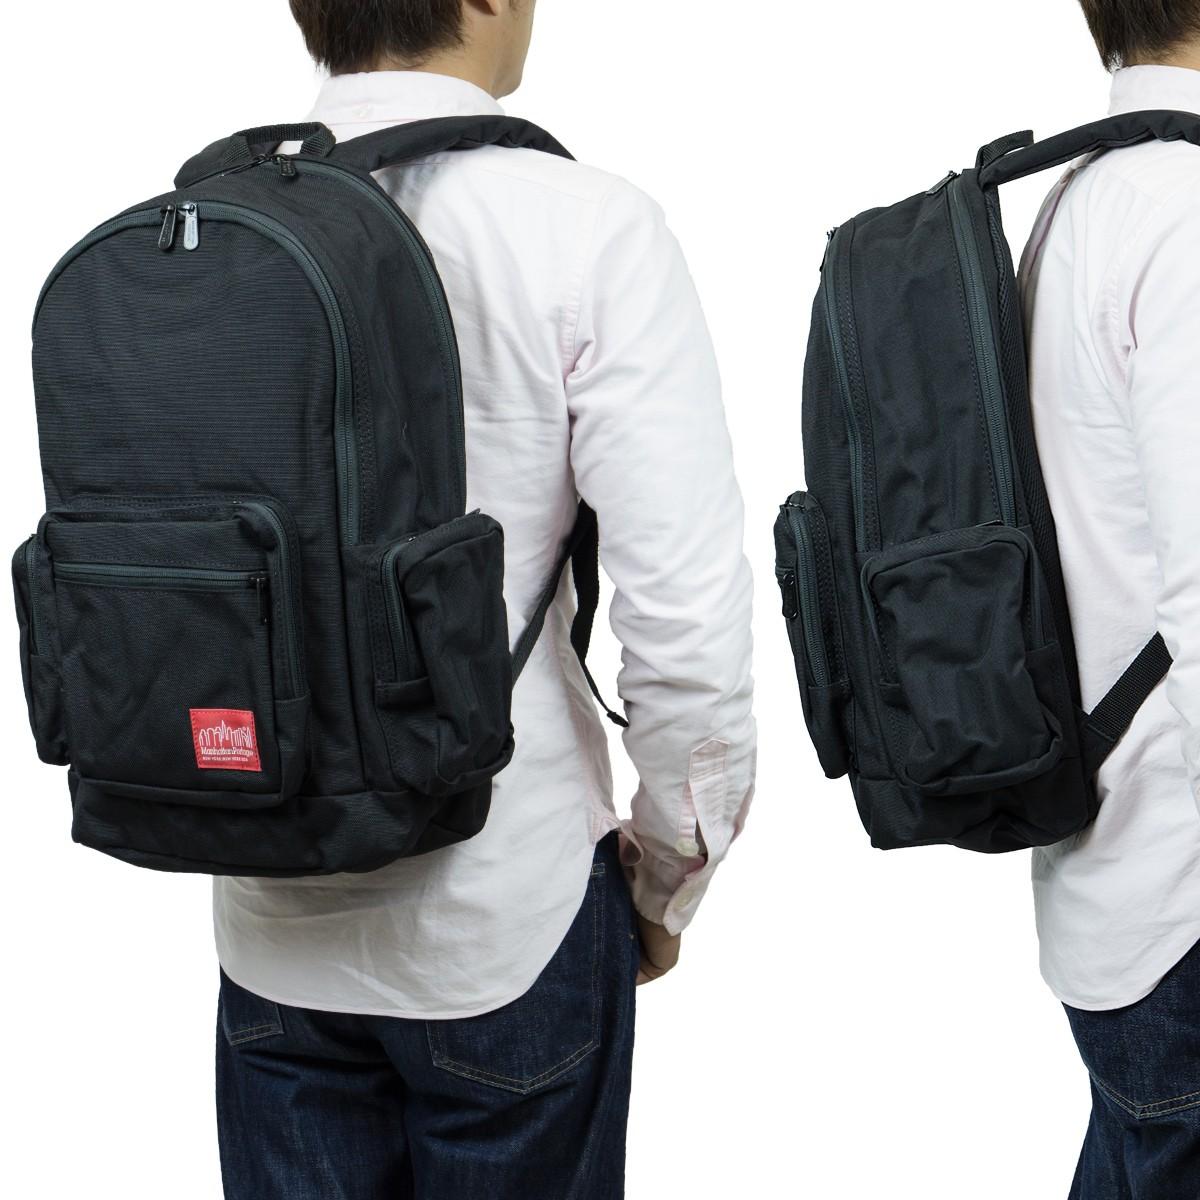 Manhattan Portage/マンハッタンポーテージ/バックパック/BDWY Backpack/MP1273/着用